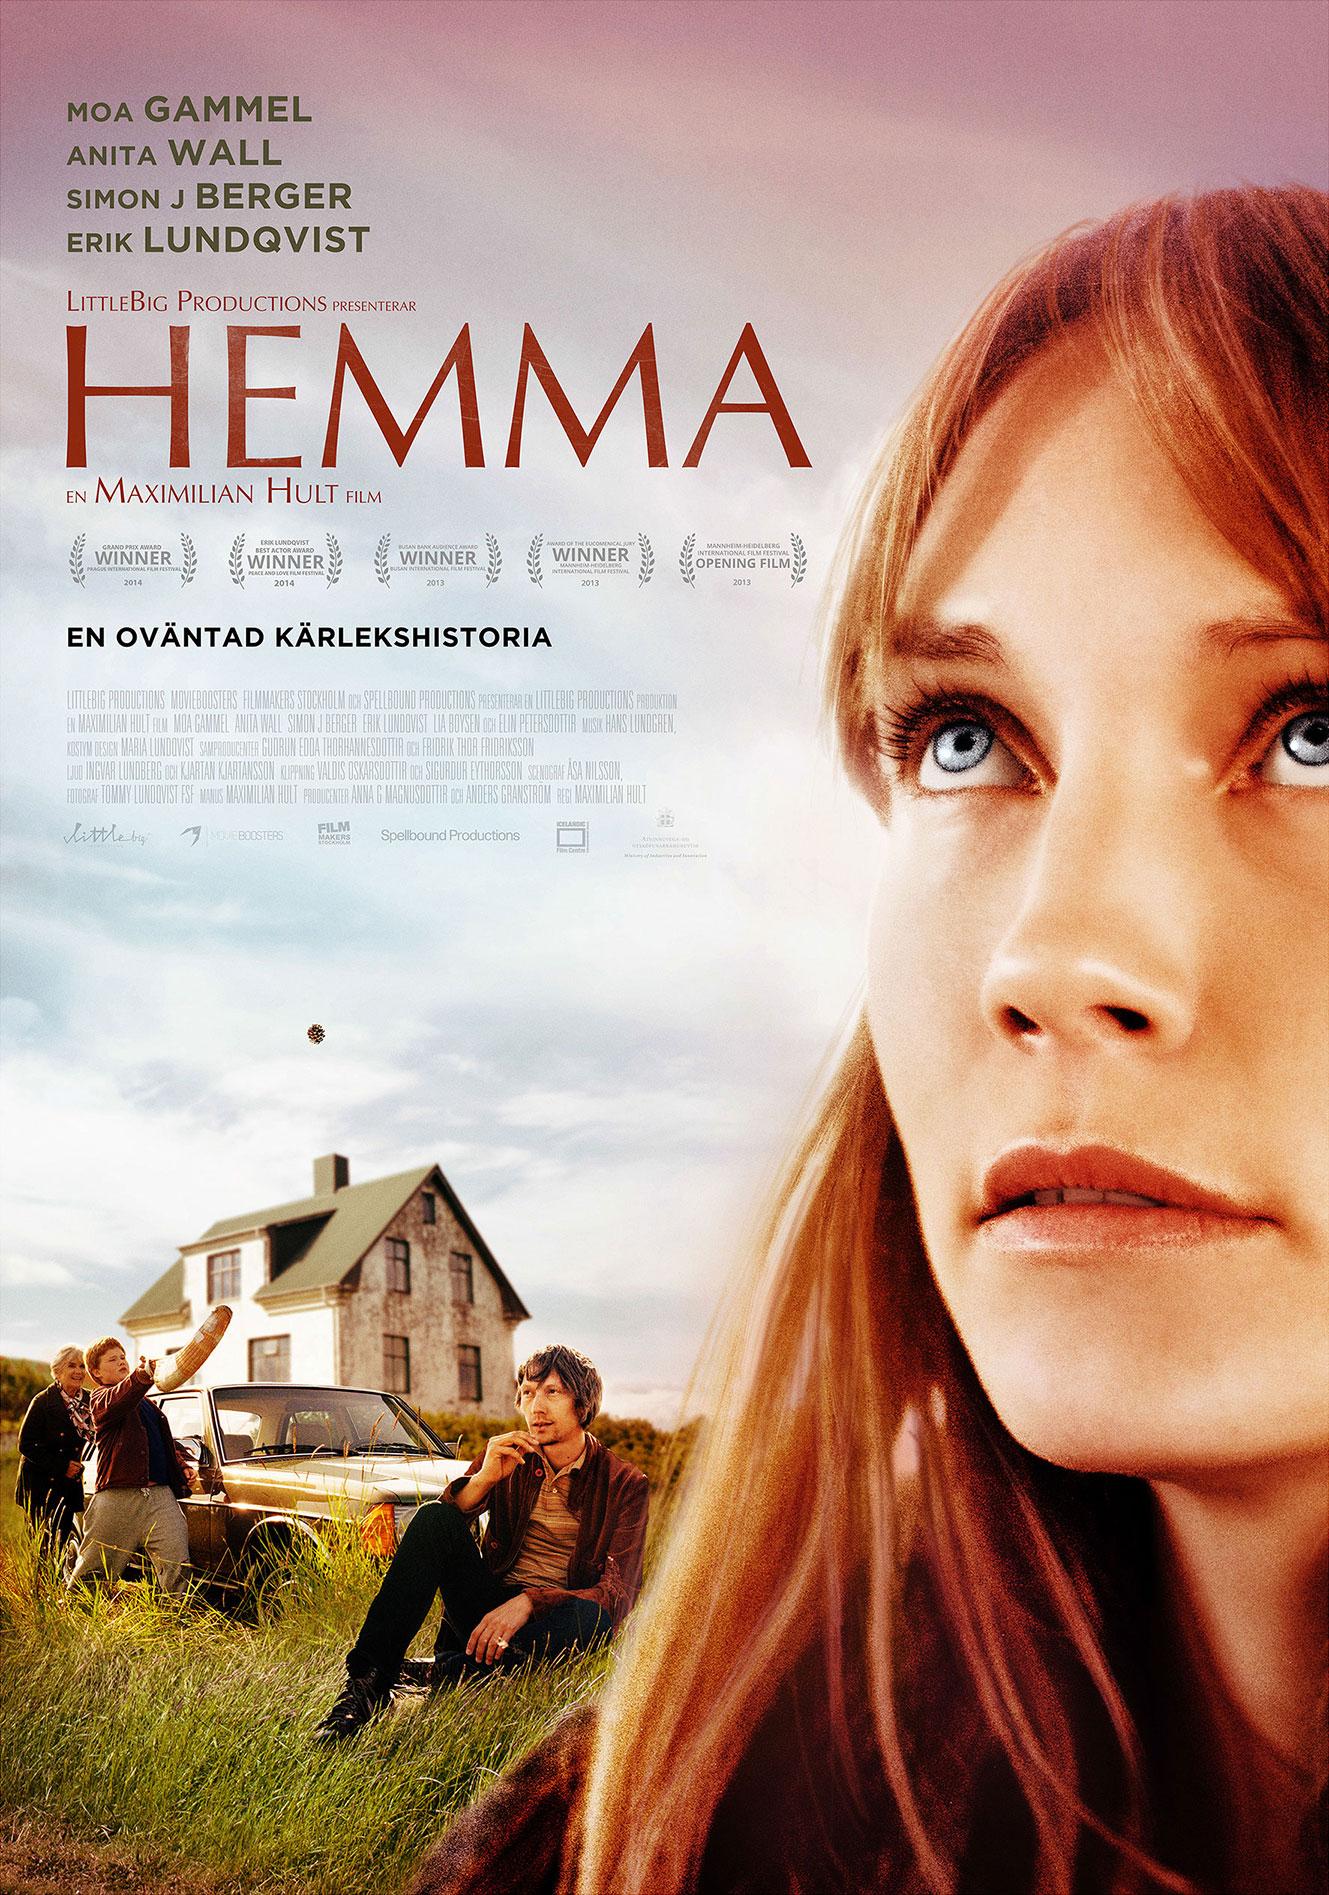 Hemma_sv_web_movieboosters